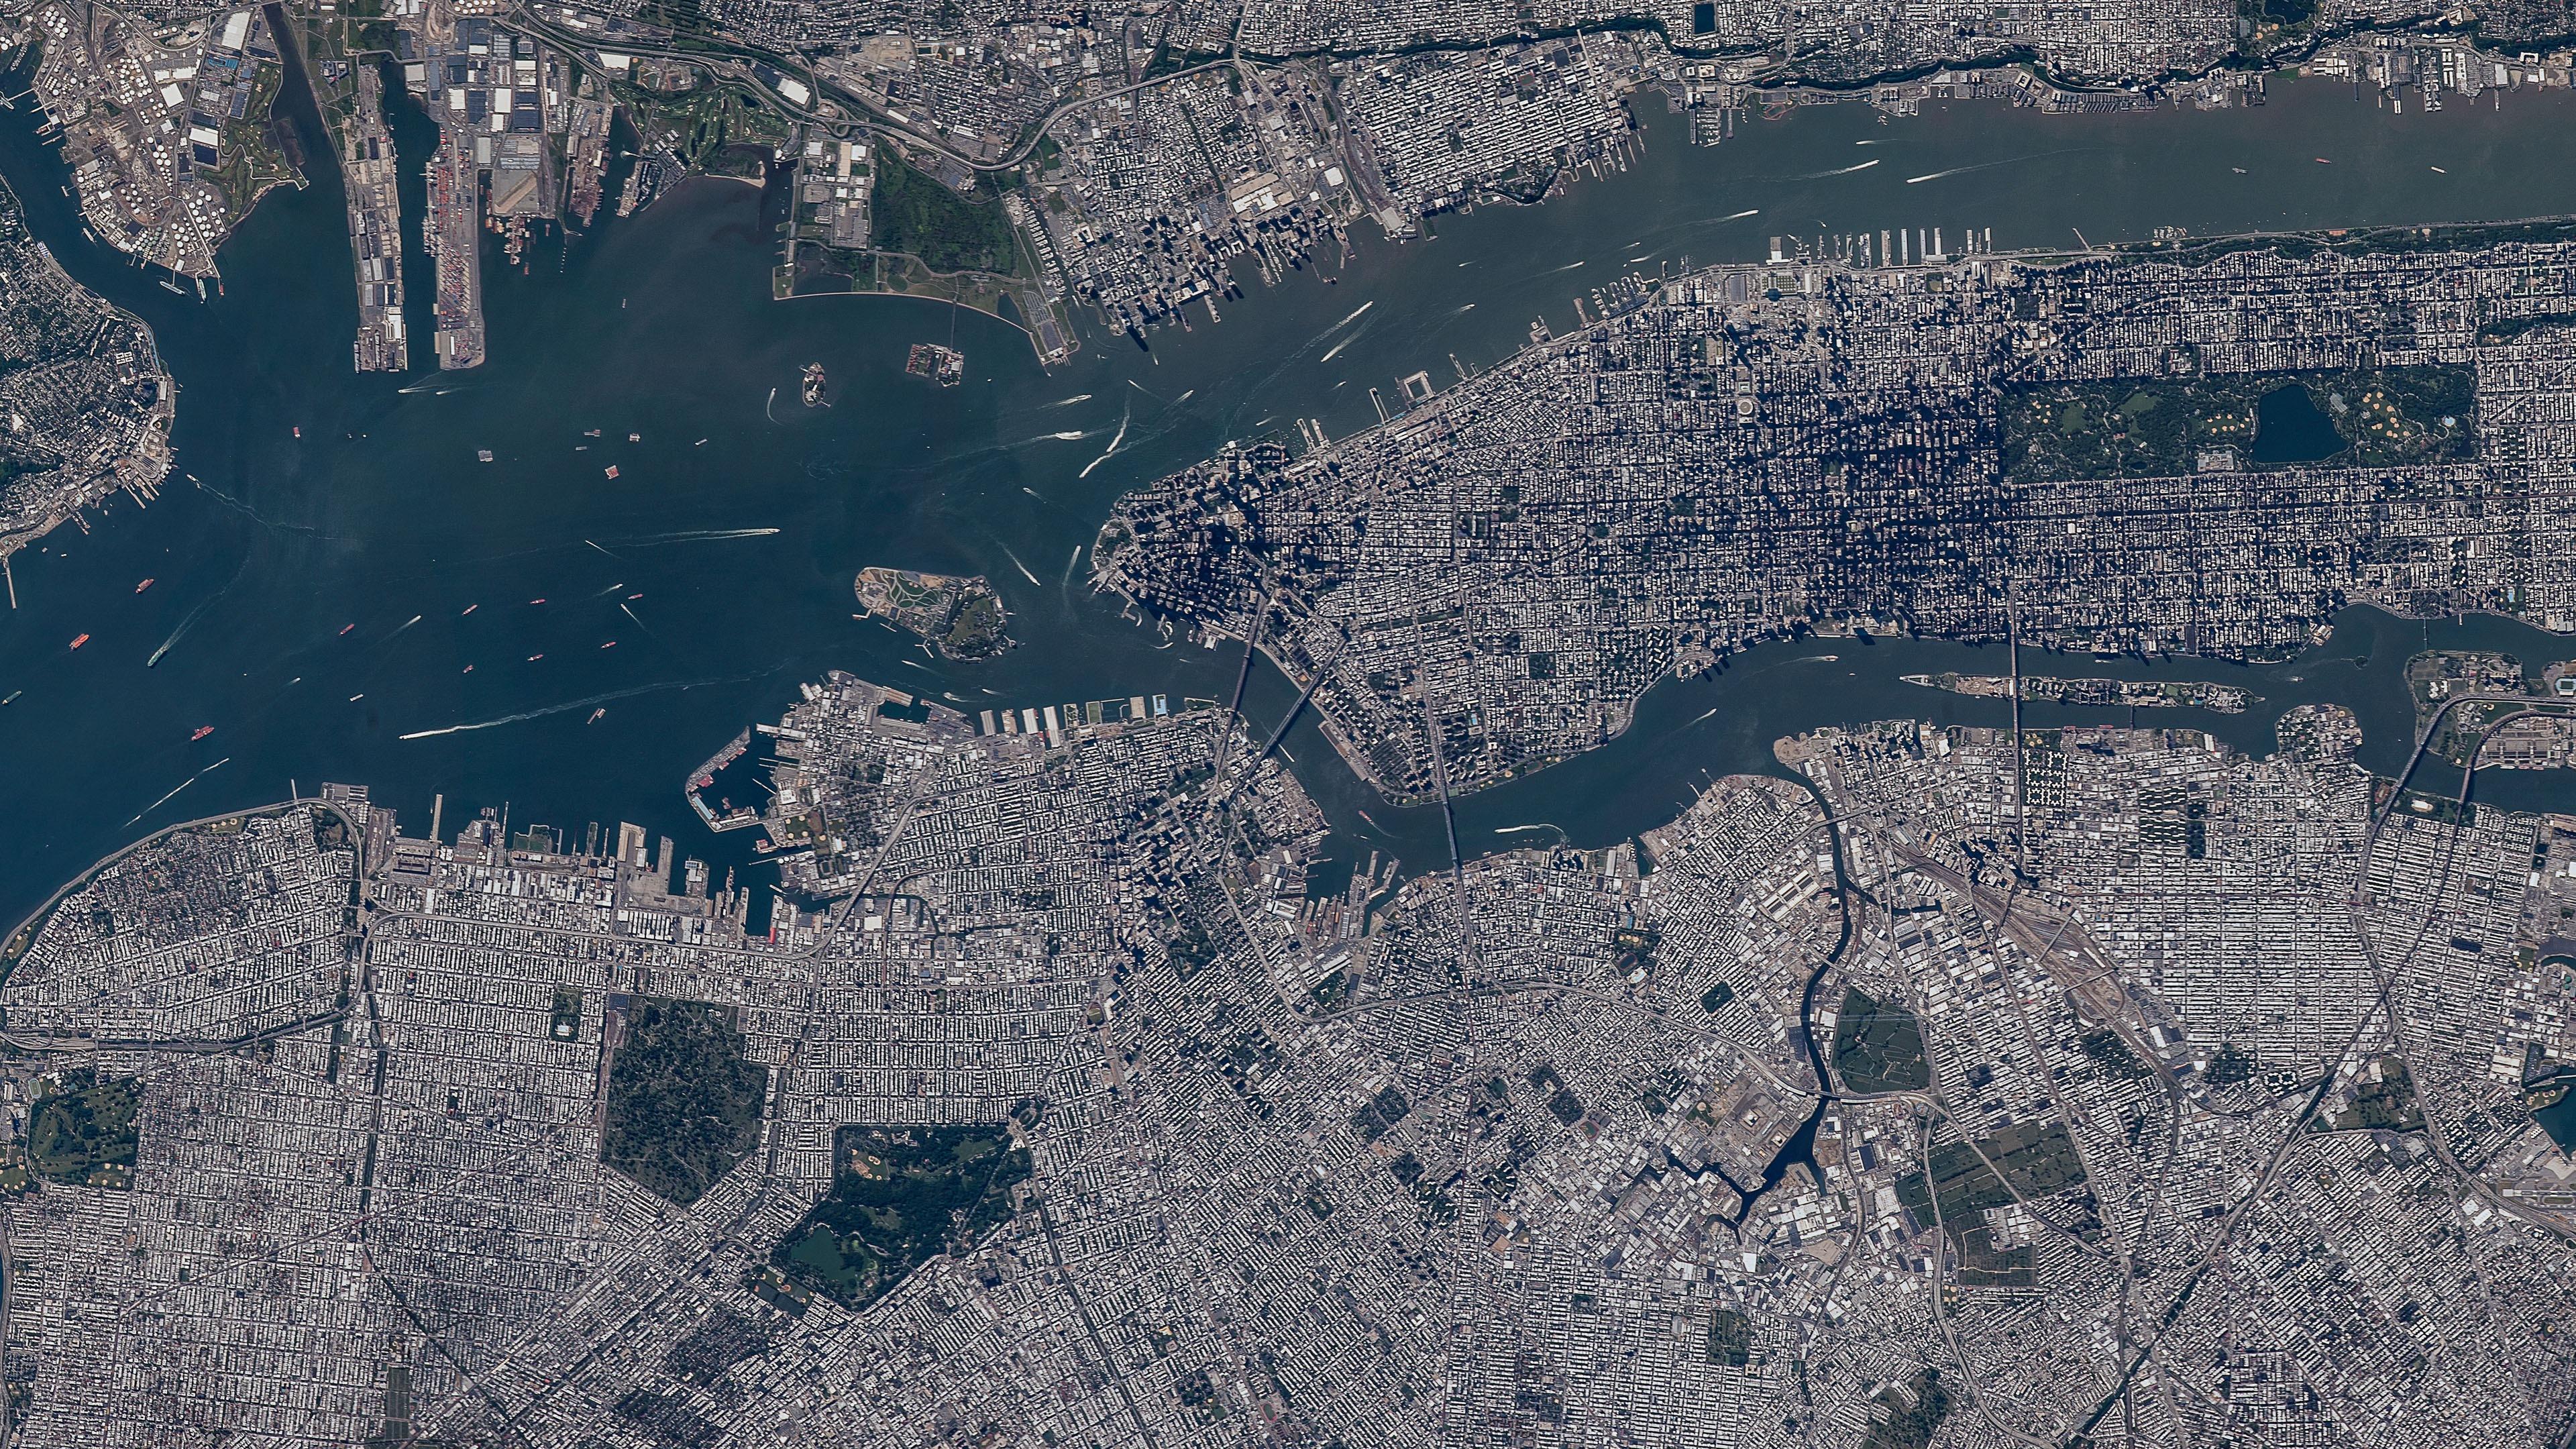 Brooklyn, Queen & Manhattan Viewed from a Satellite wallpaper